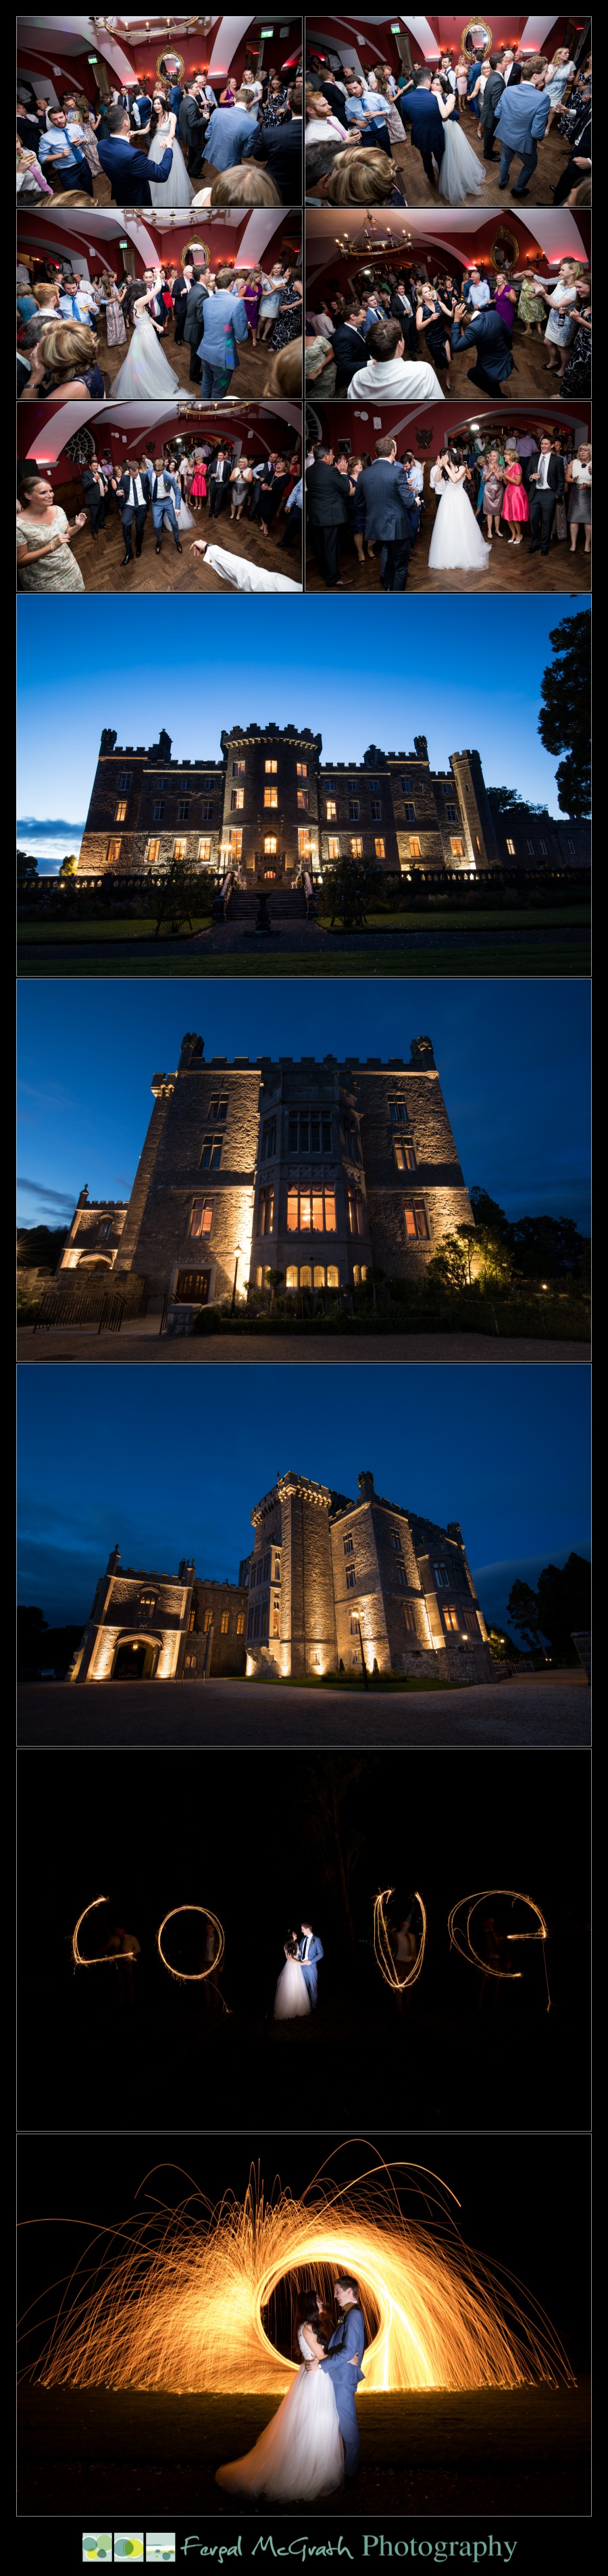 Markree Castle Wedding at night